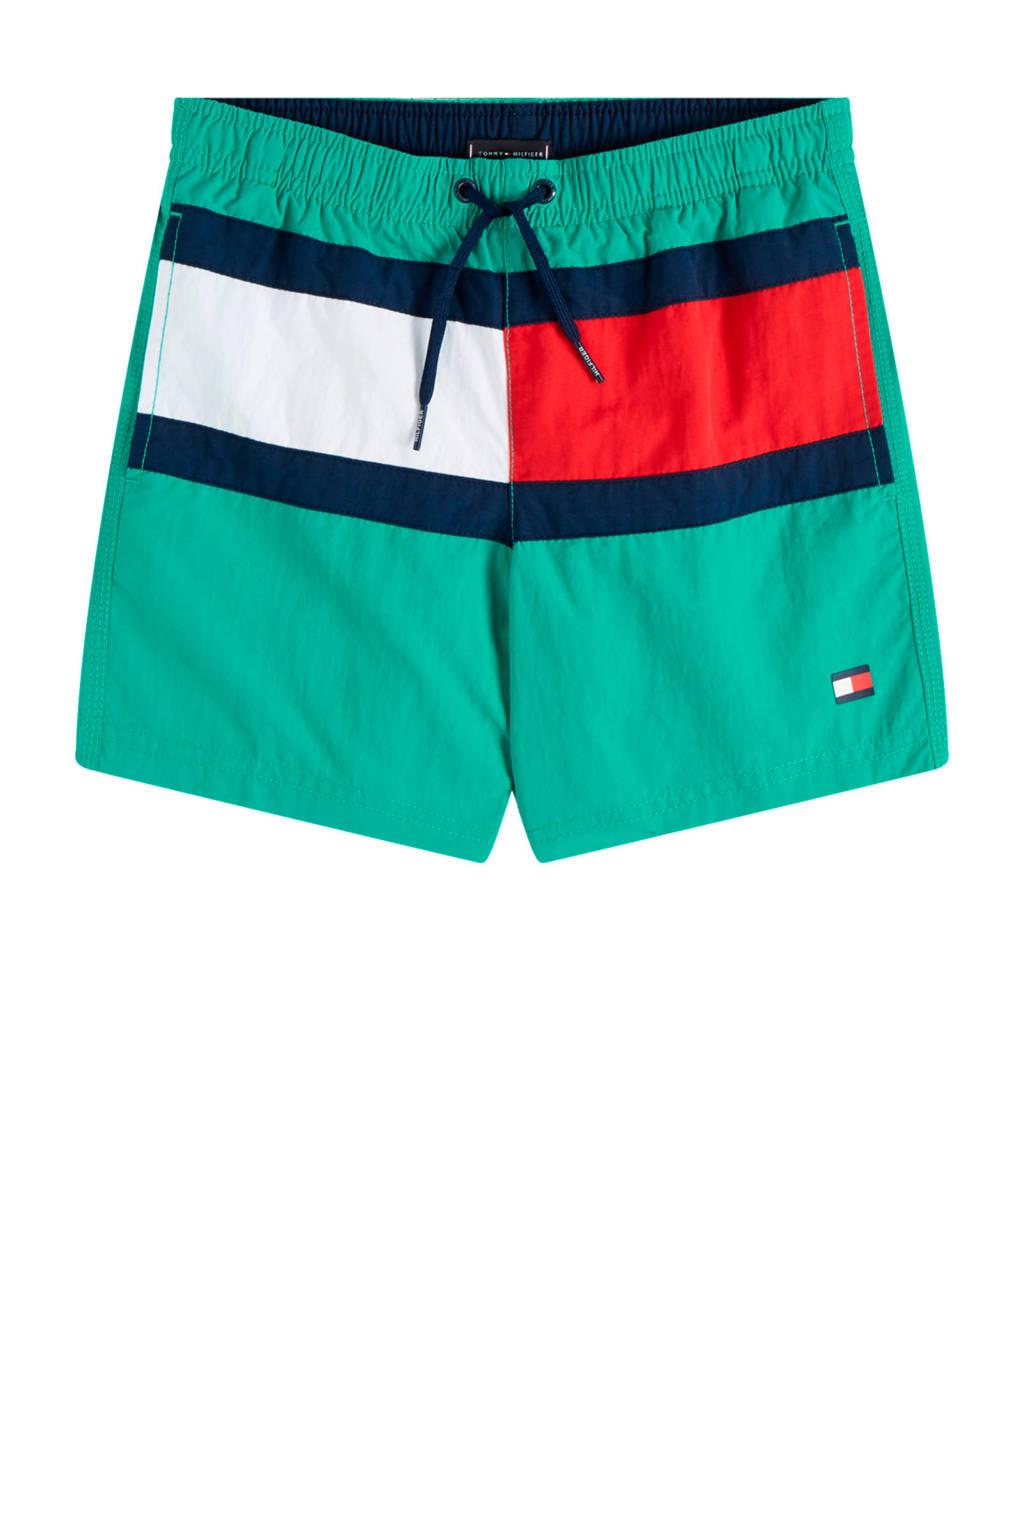 Tommy Hilfiger zwemshort turquoise, Turquoise